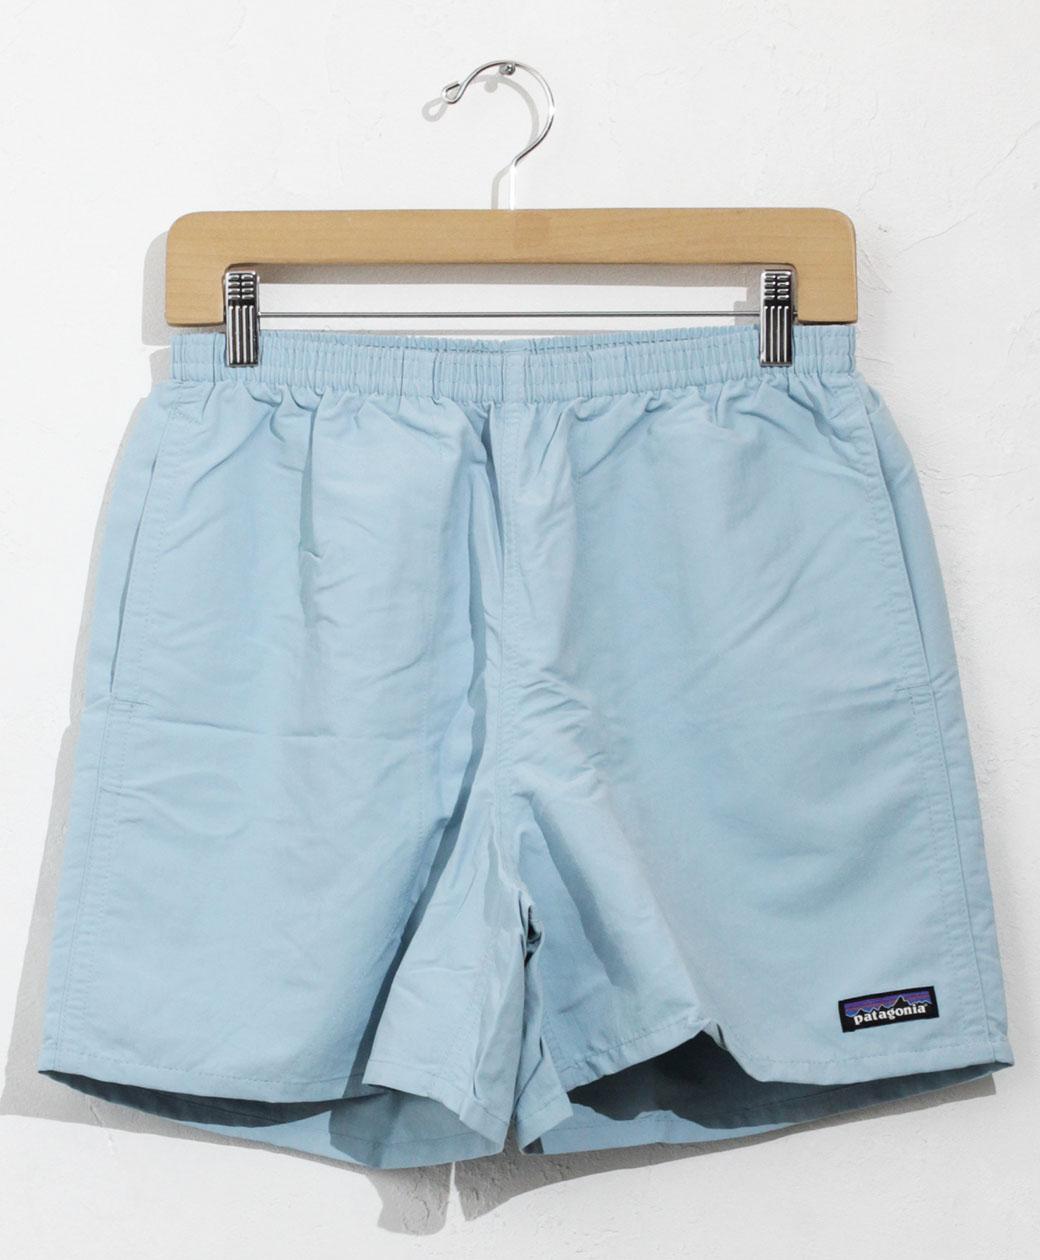 patagonia M's Baggies Shorts 5(BSBL)